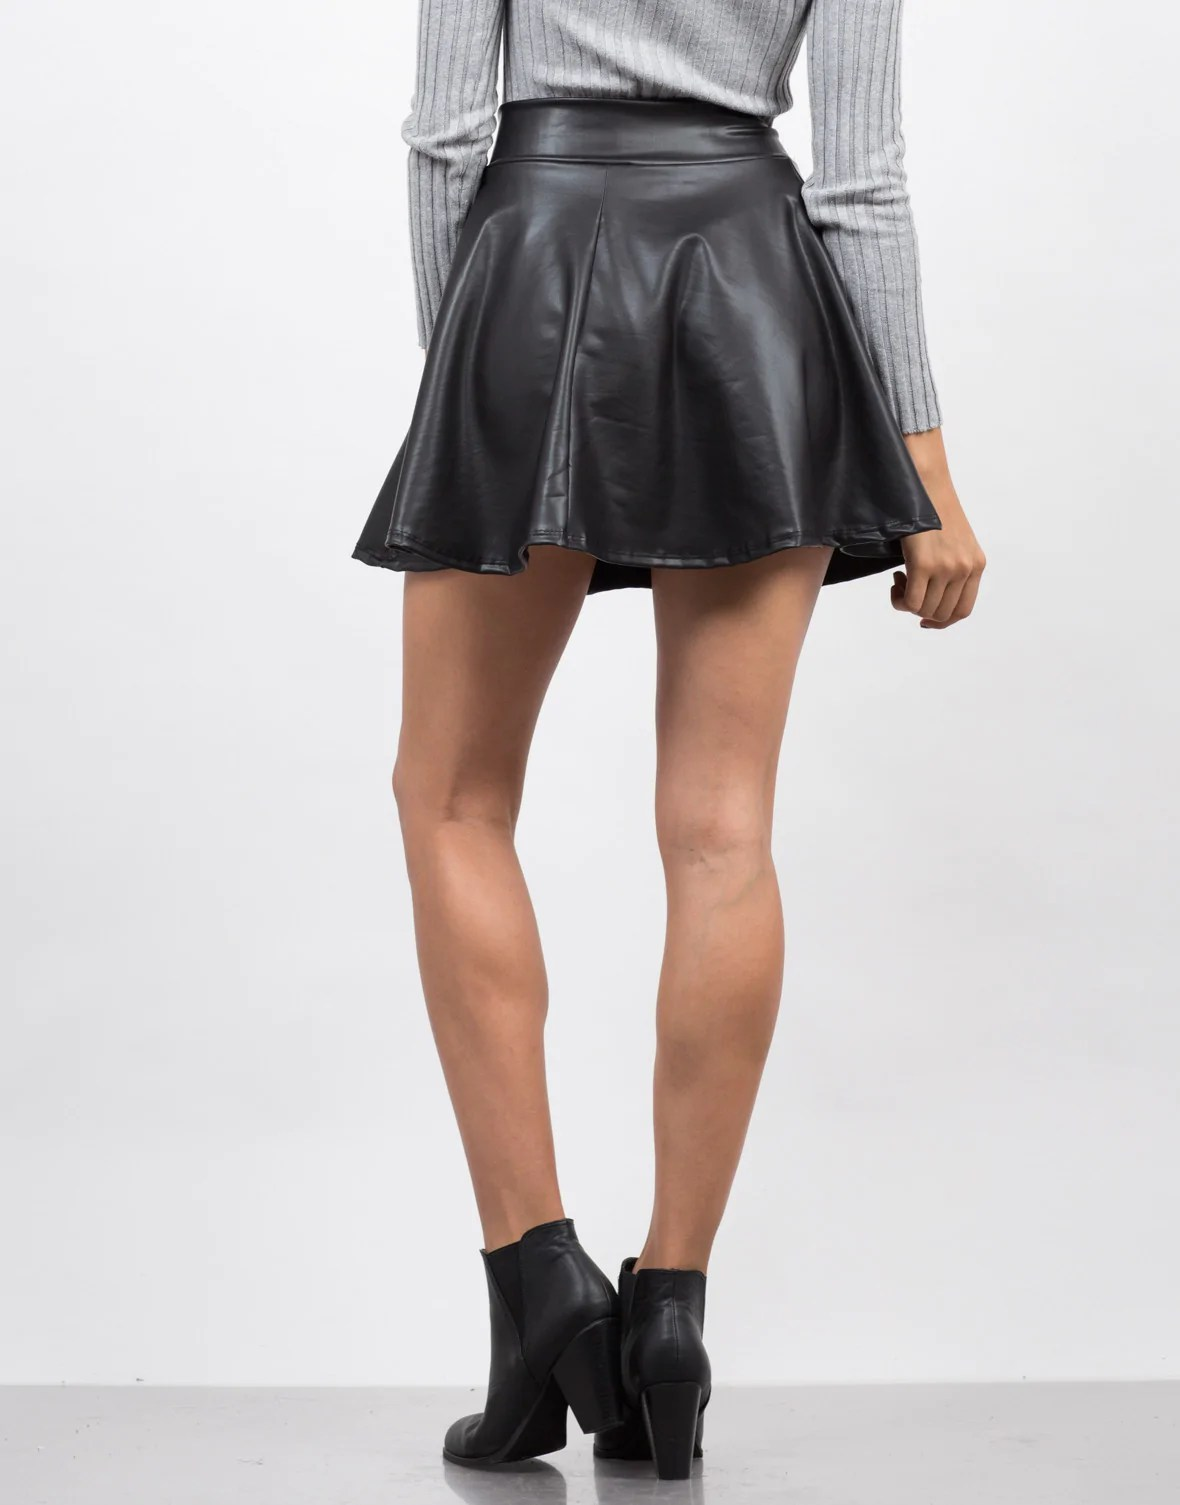 RSVH WSS Women Celeb Black Wet Look Faux Leather Look Flared Mini Skater Skirt